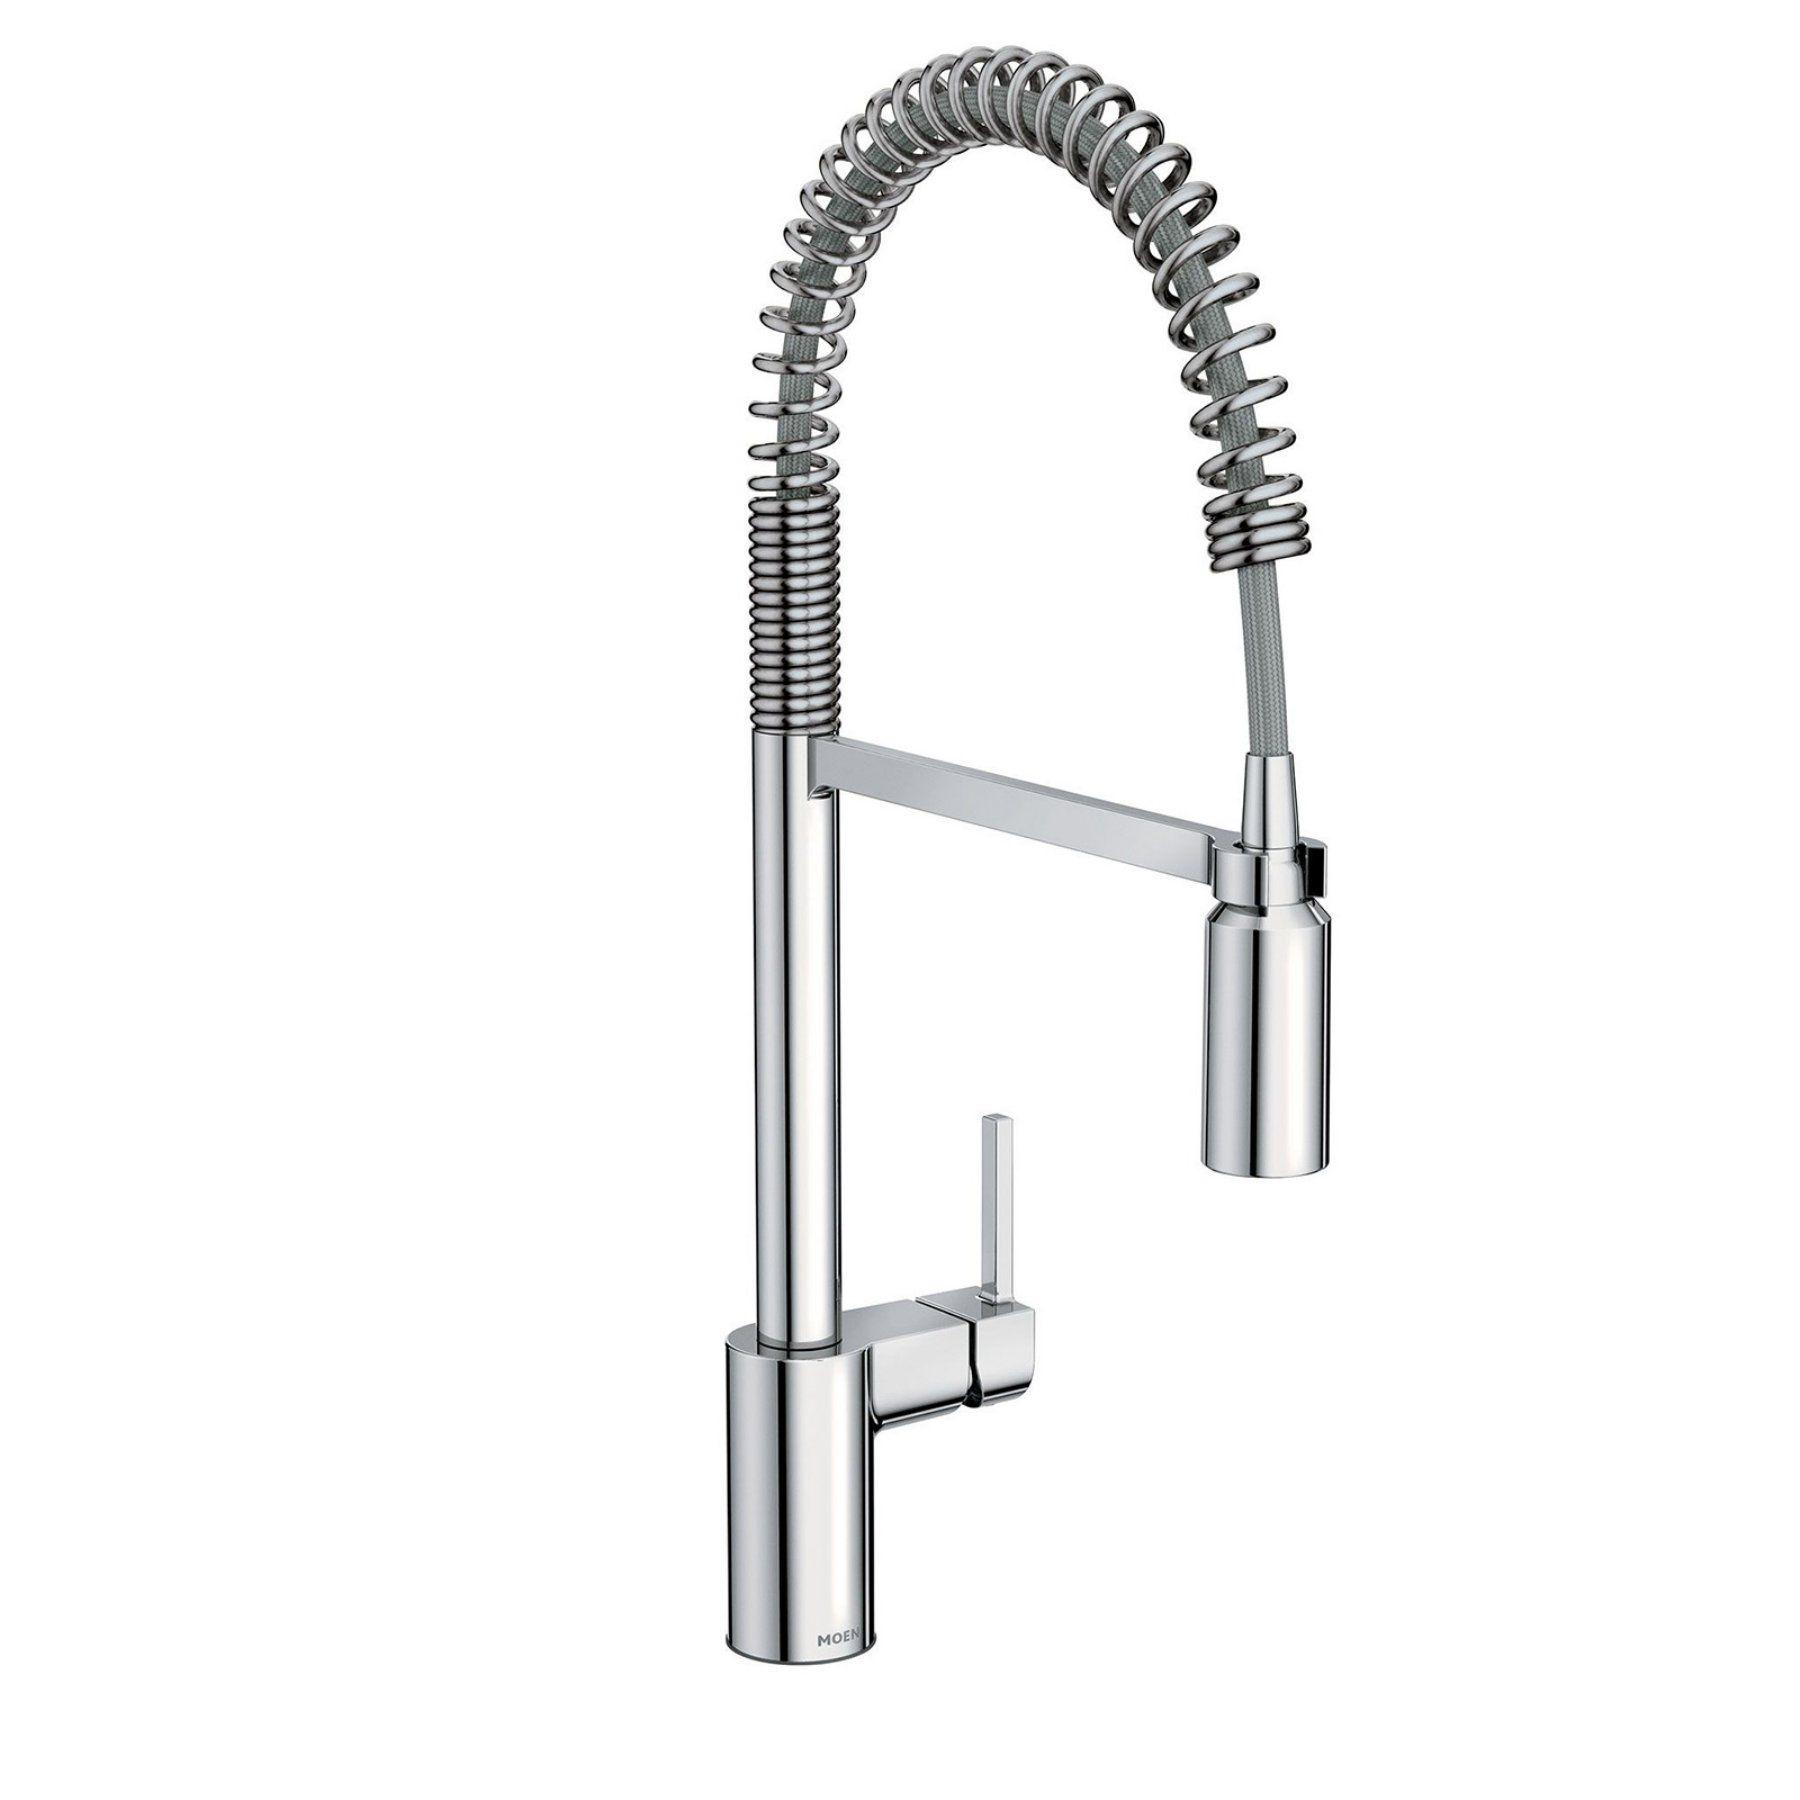 Moen Align 5923 Single Handle Pull Down Kitchen Faucet Kitchen